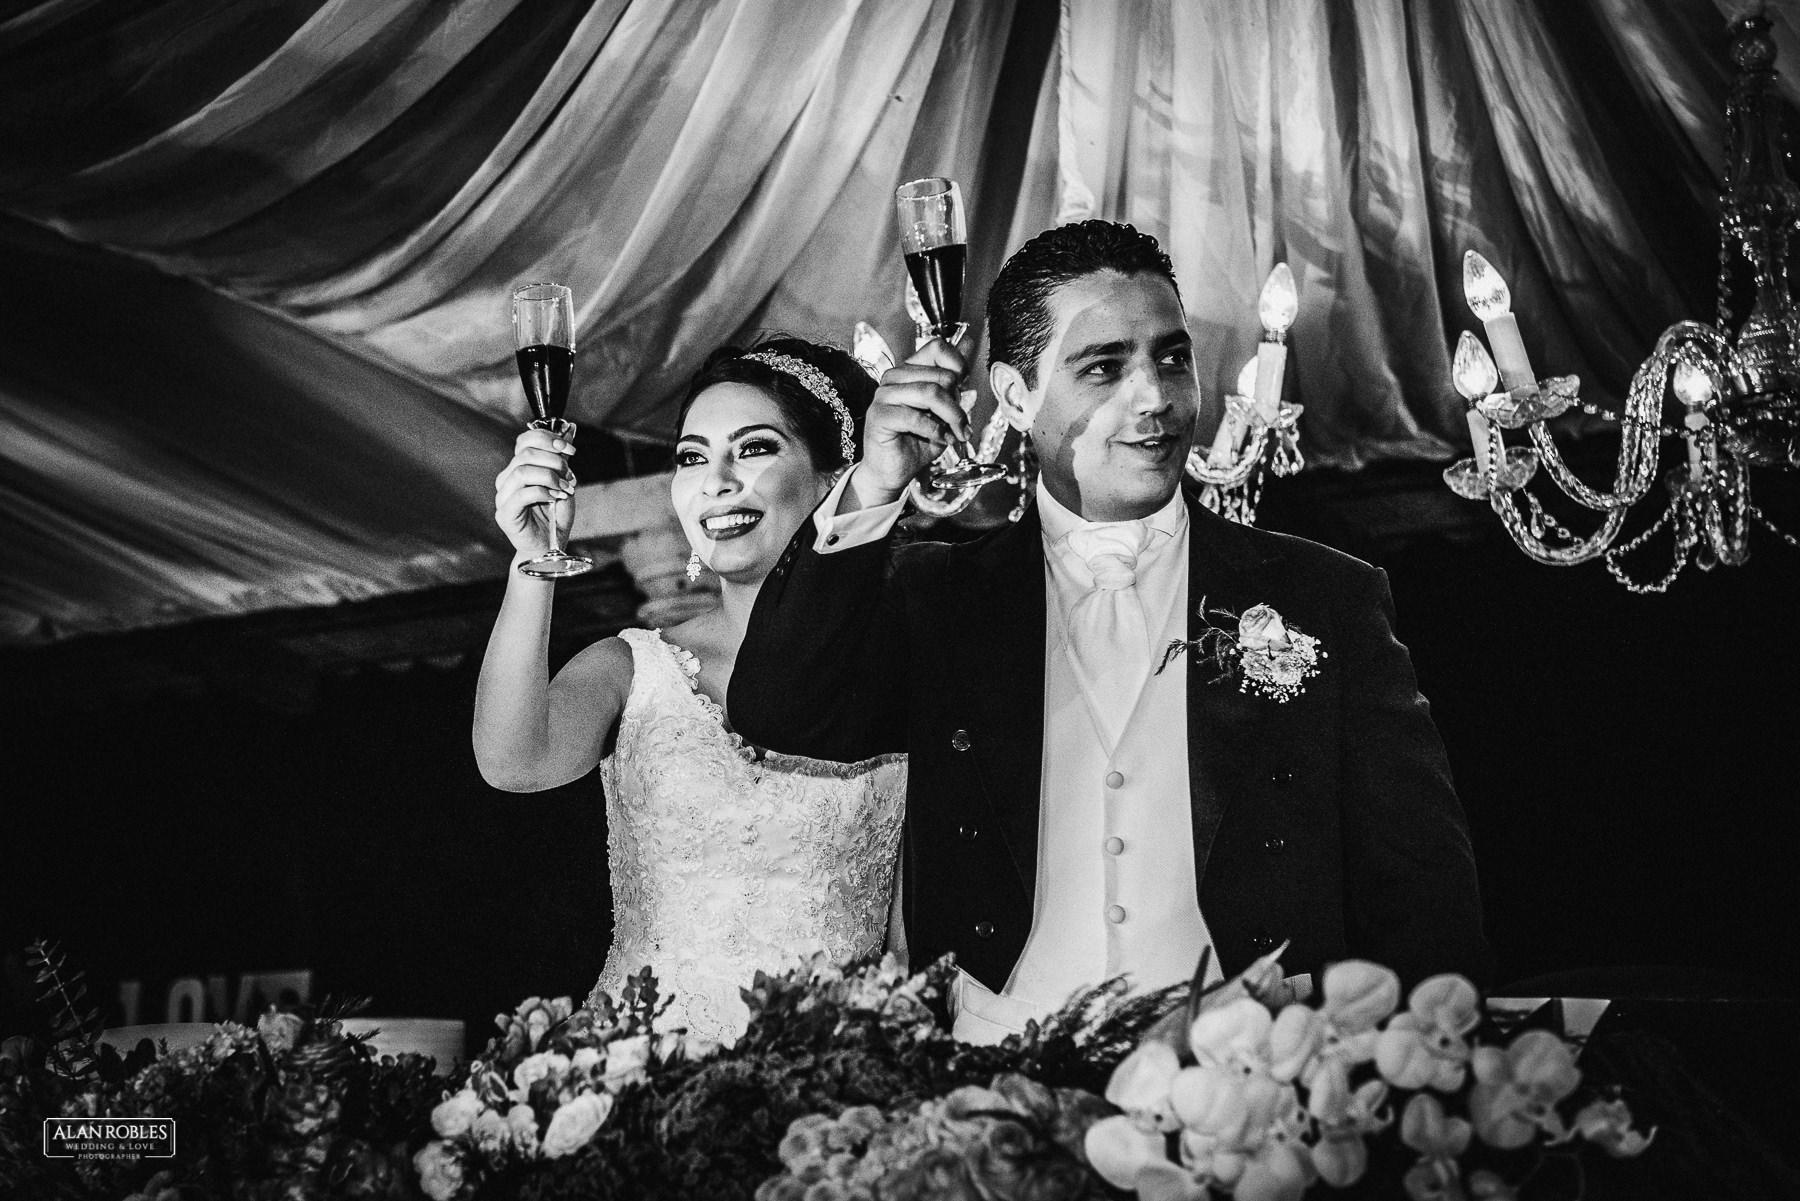 Alan Robles fotografo de bodas guadalajara - LyP Hotel Demetria-72